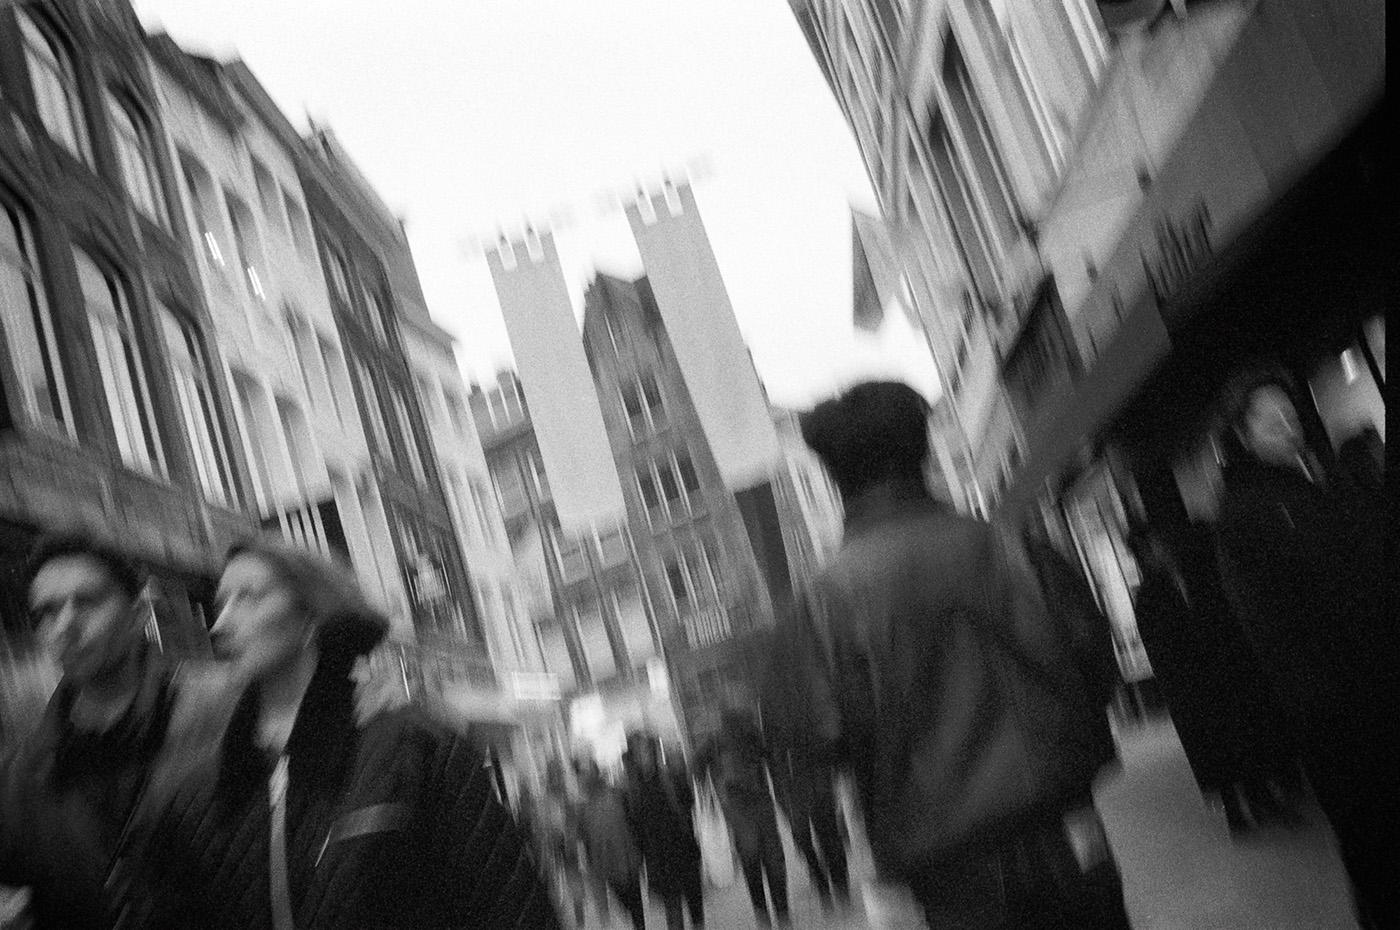 Foreign Street, Belgium